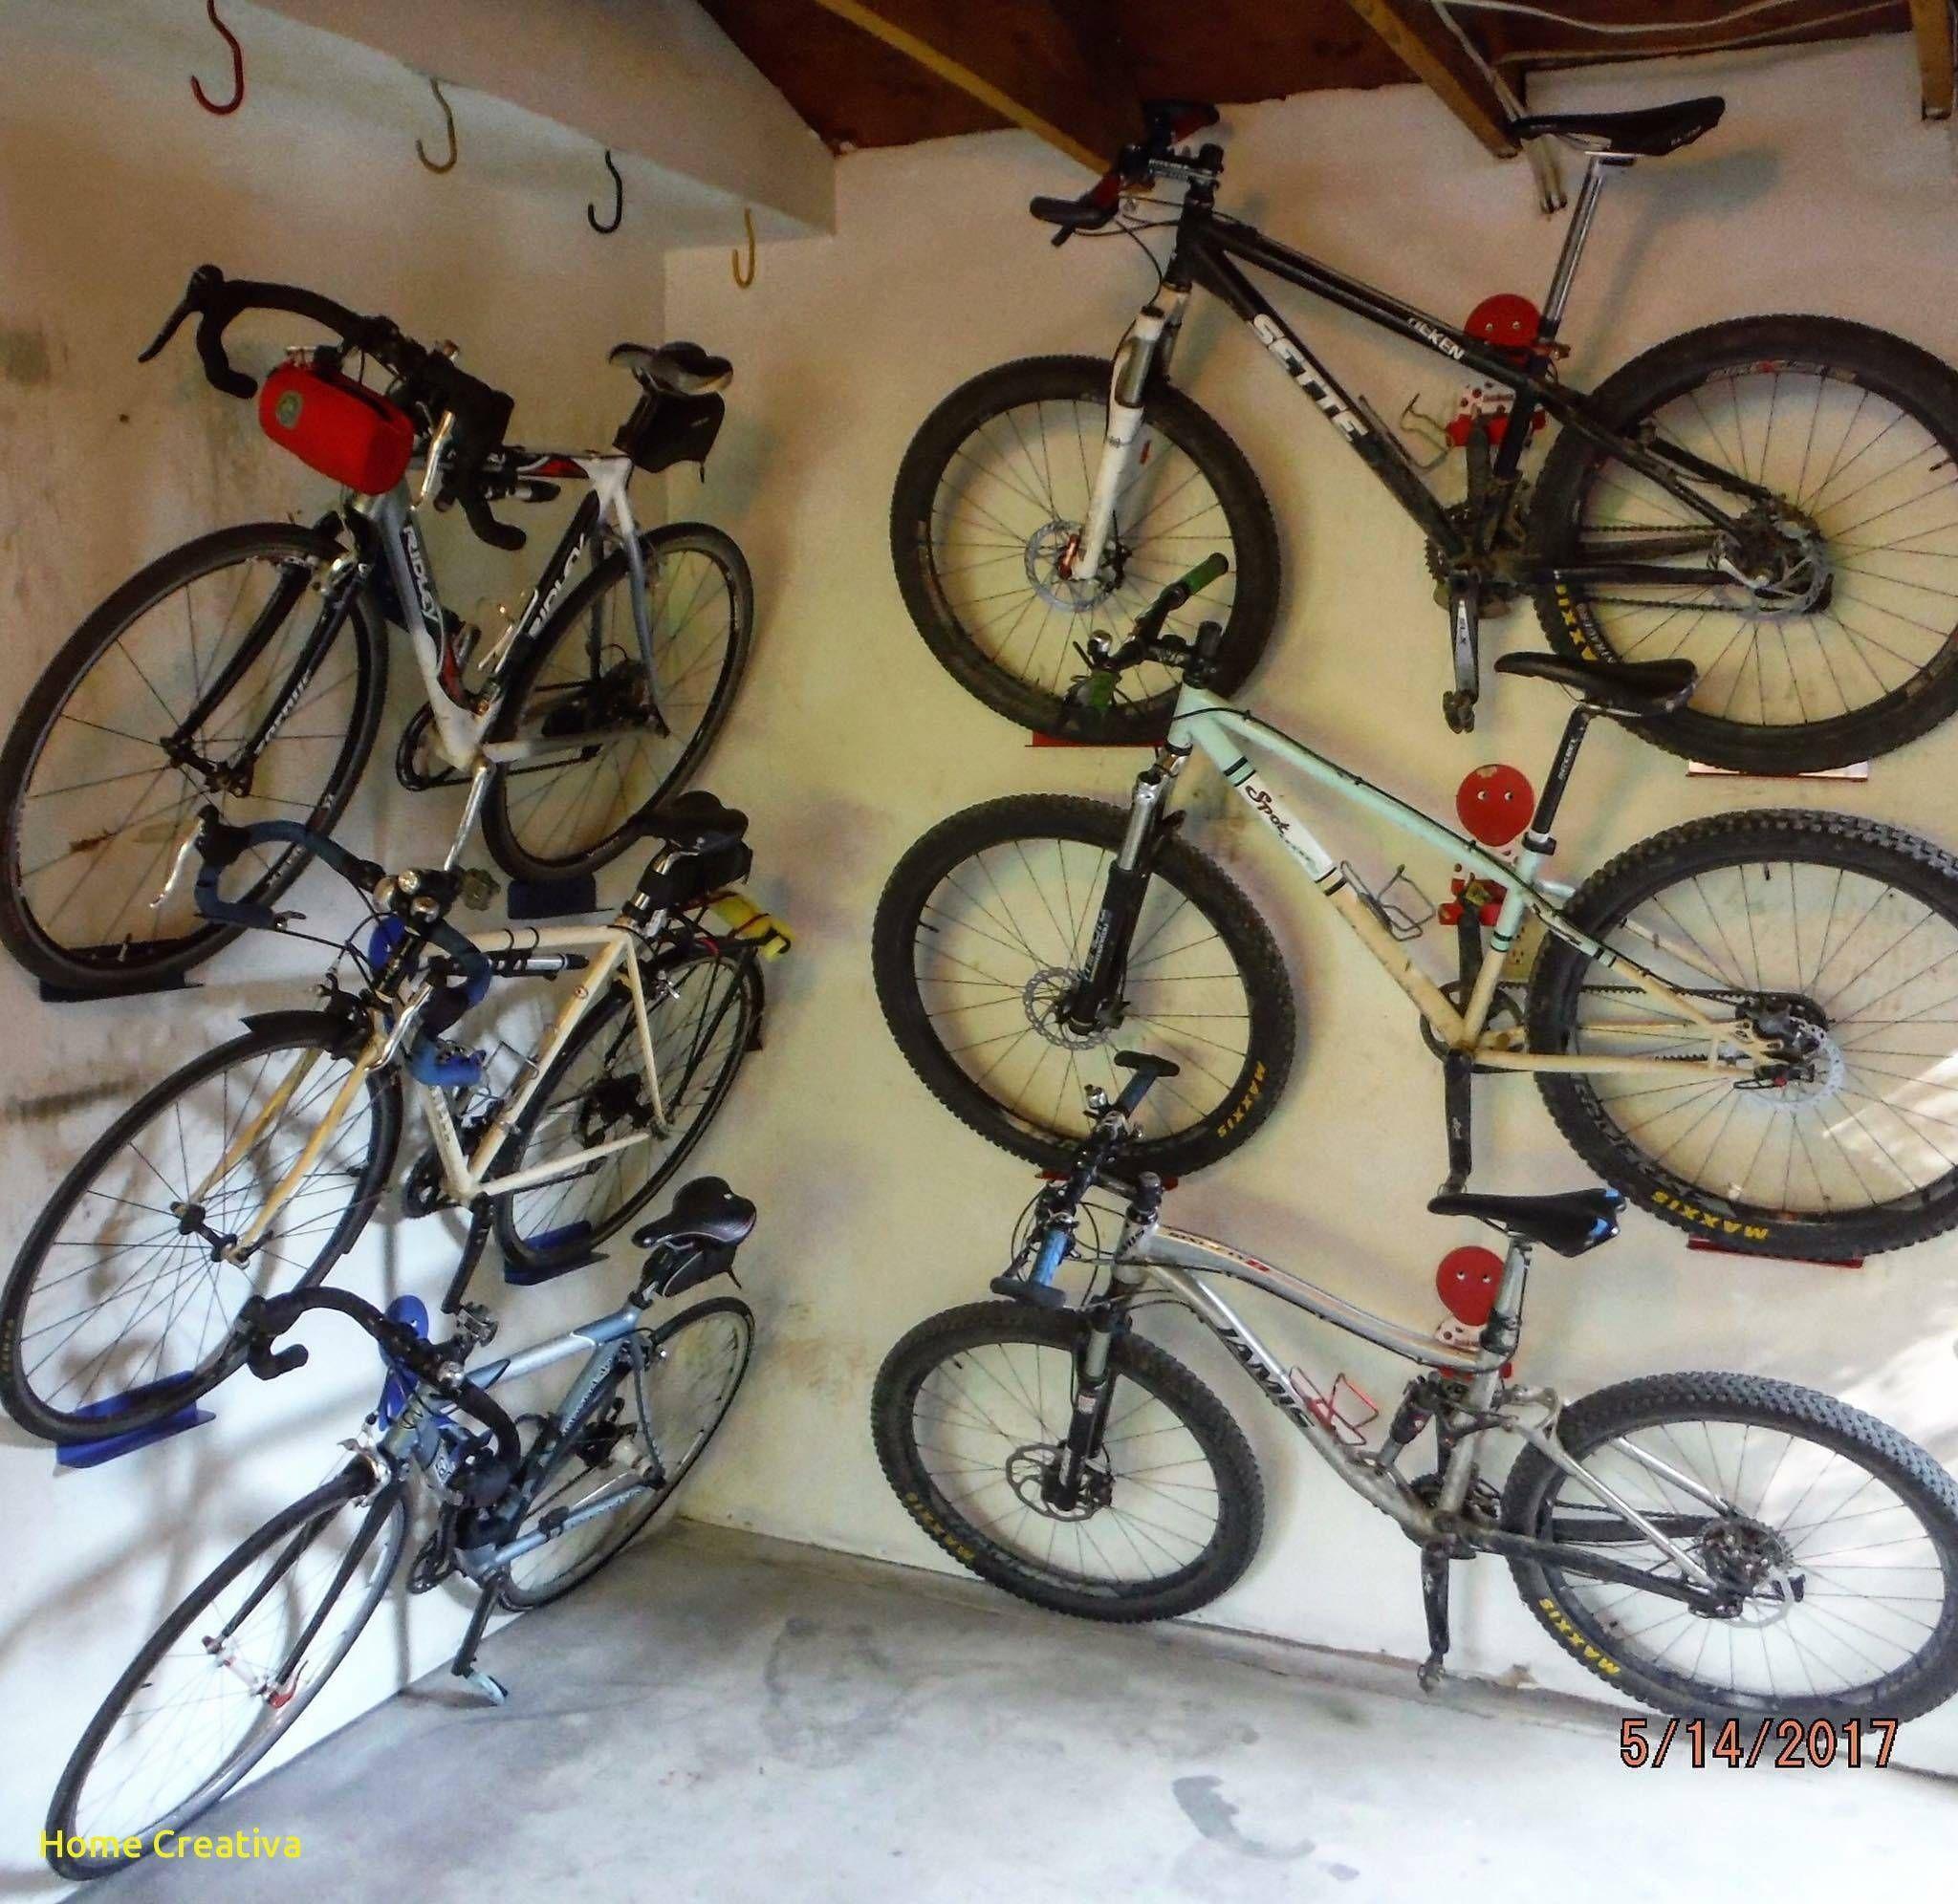 Incredible Bicycle Wall Bracket Https Homecreativa Com Bicycle Wall Bracket Homedecoration Ho Bike Storage Garage Bicycle Storage Wall Mount Bike Rack